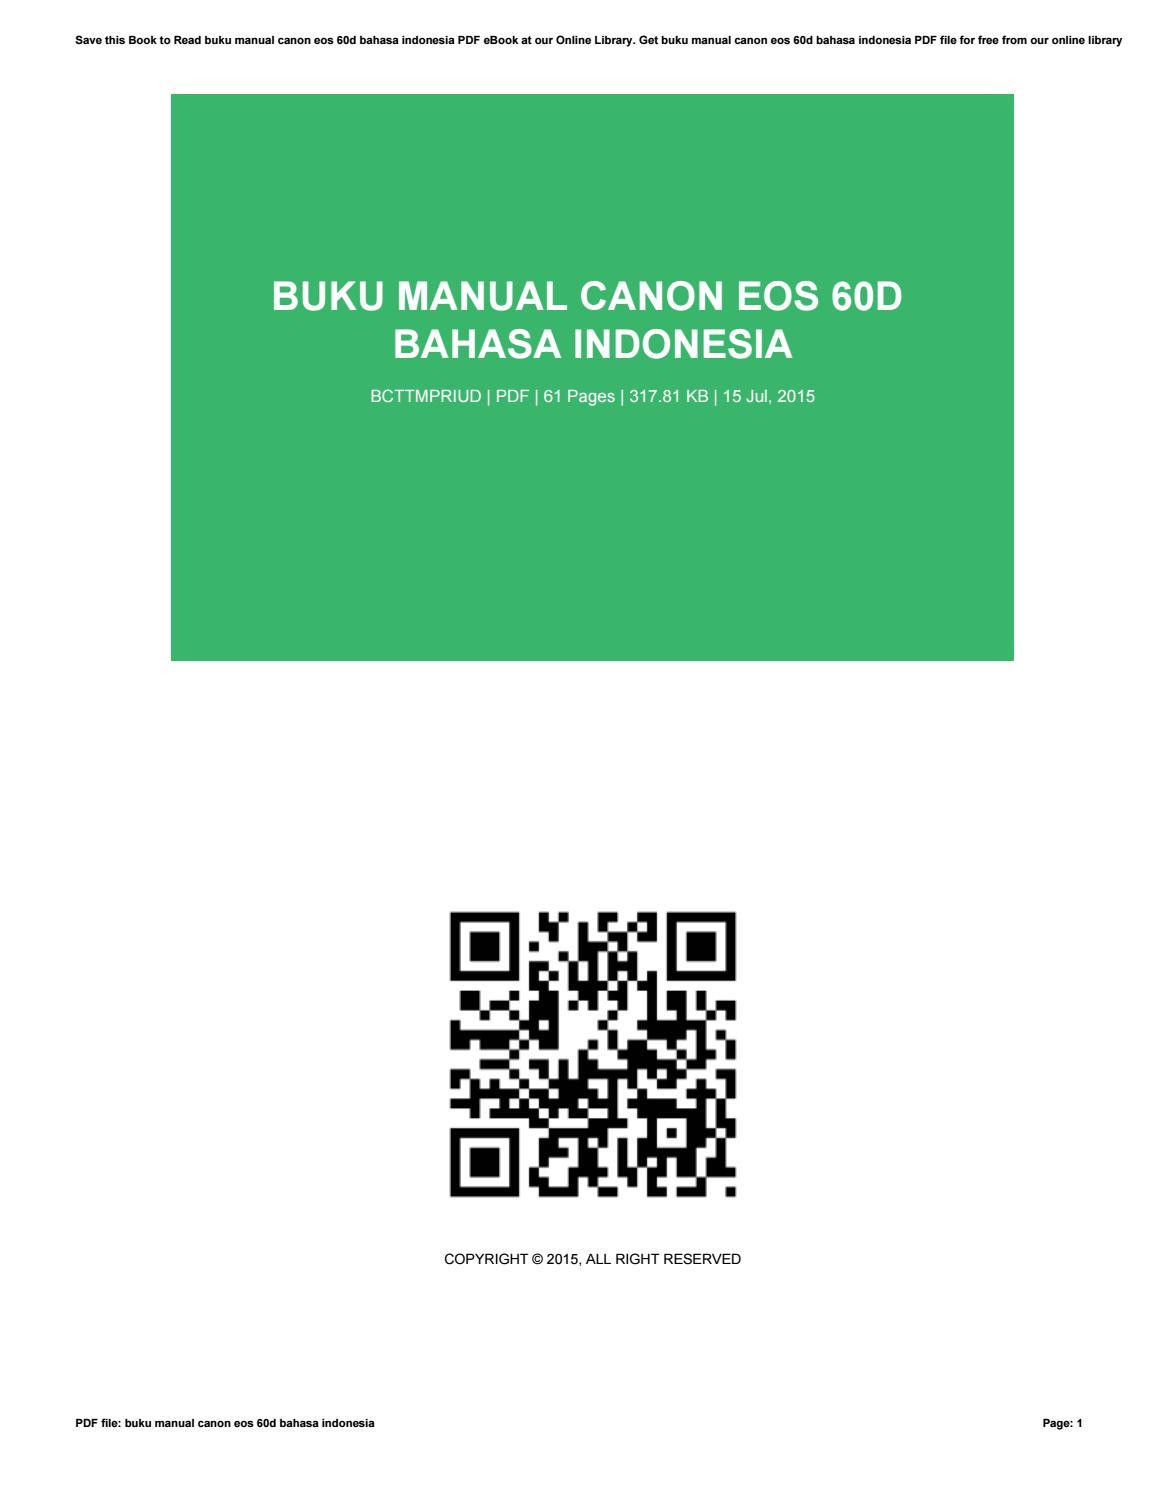 Pdf] manual book canon 60d bahasa indonesia [d0wnl04d] video.